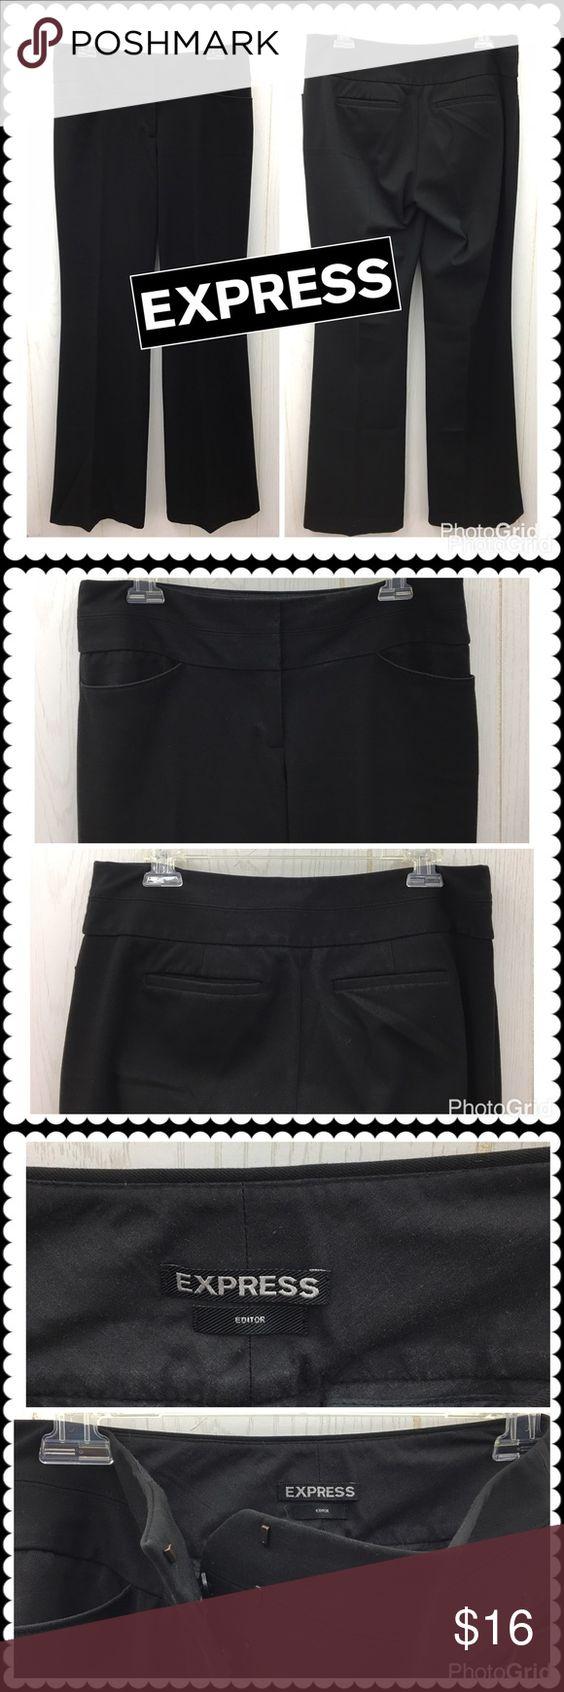 "Black dress slacks by EXPRESS Editor Sz 6 Long Black dress pants by EXPRESS. Editor. Long Inseam. Zip fly, hook waist. Sz 6 Long (16"" across waist, 33"" Inseam) Great for work! Express Pants Boot Cut & Flare"